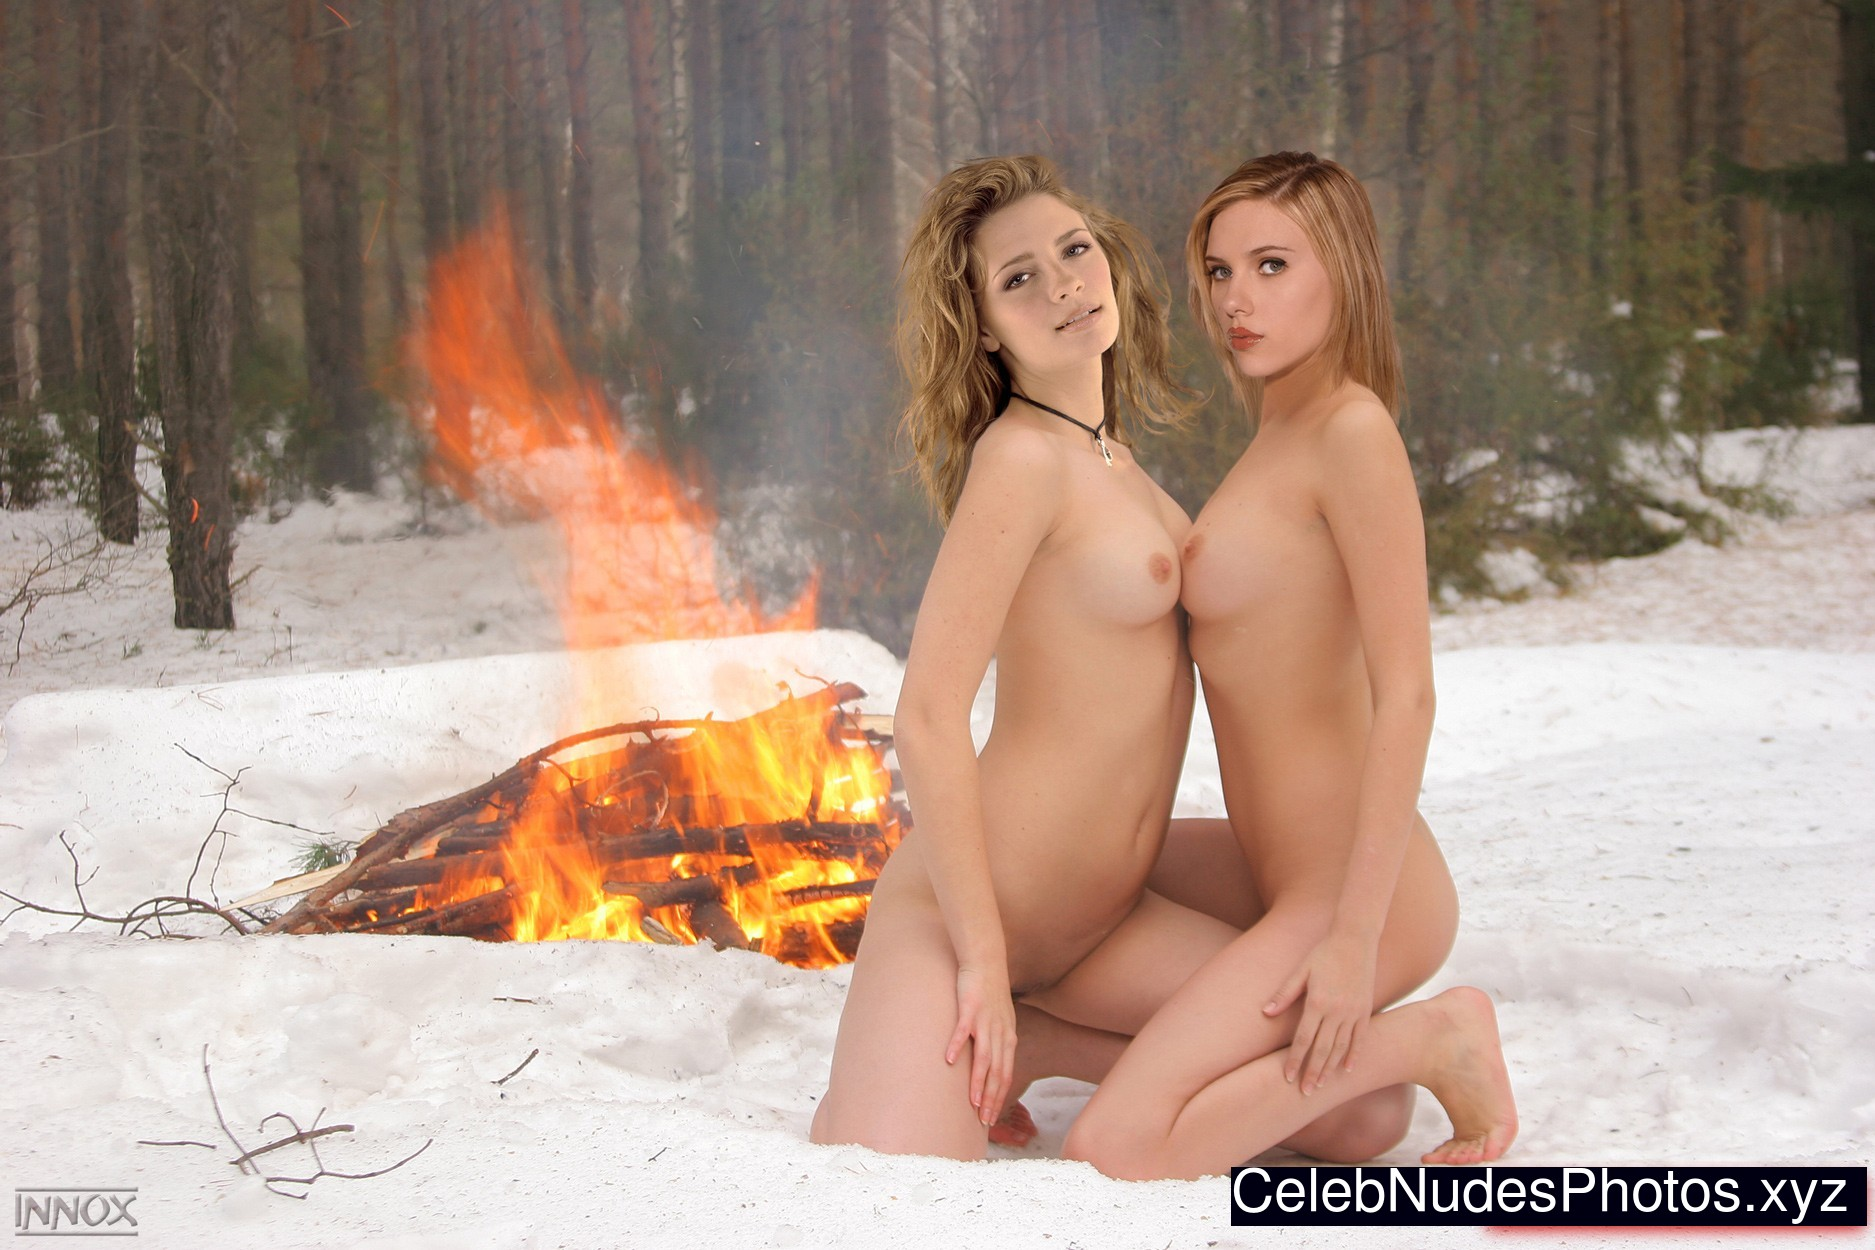 Mischa Barton nudes apologise